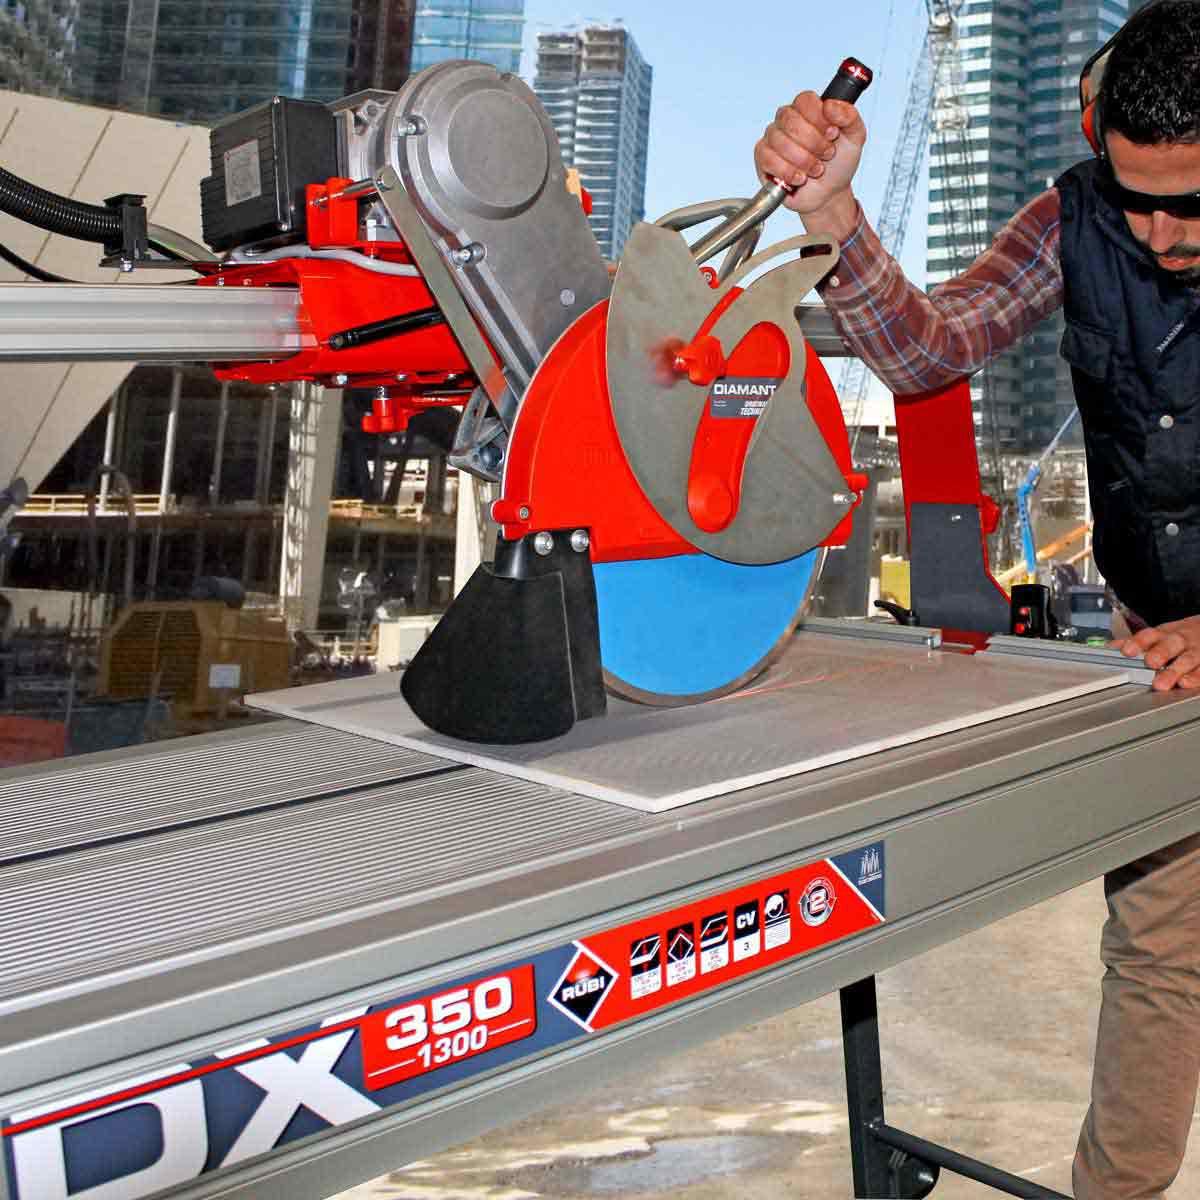 Rubi DX350 cutting using laser guide